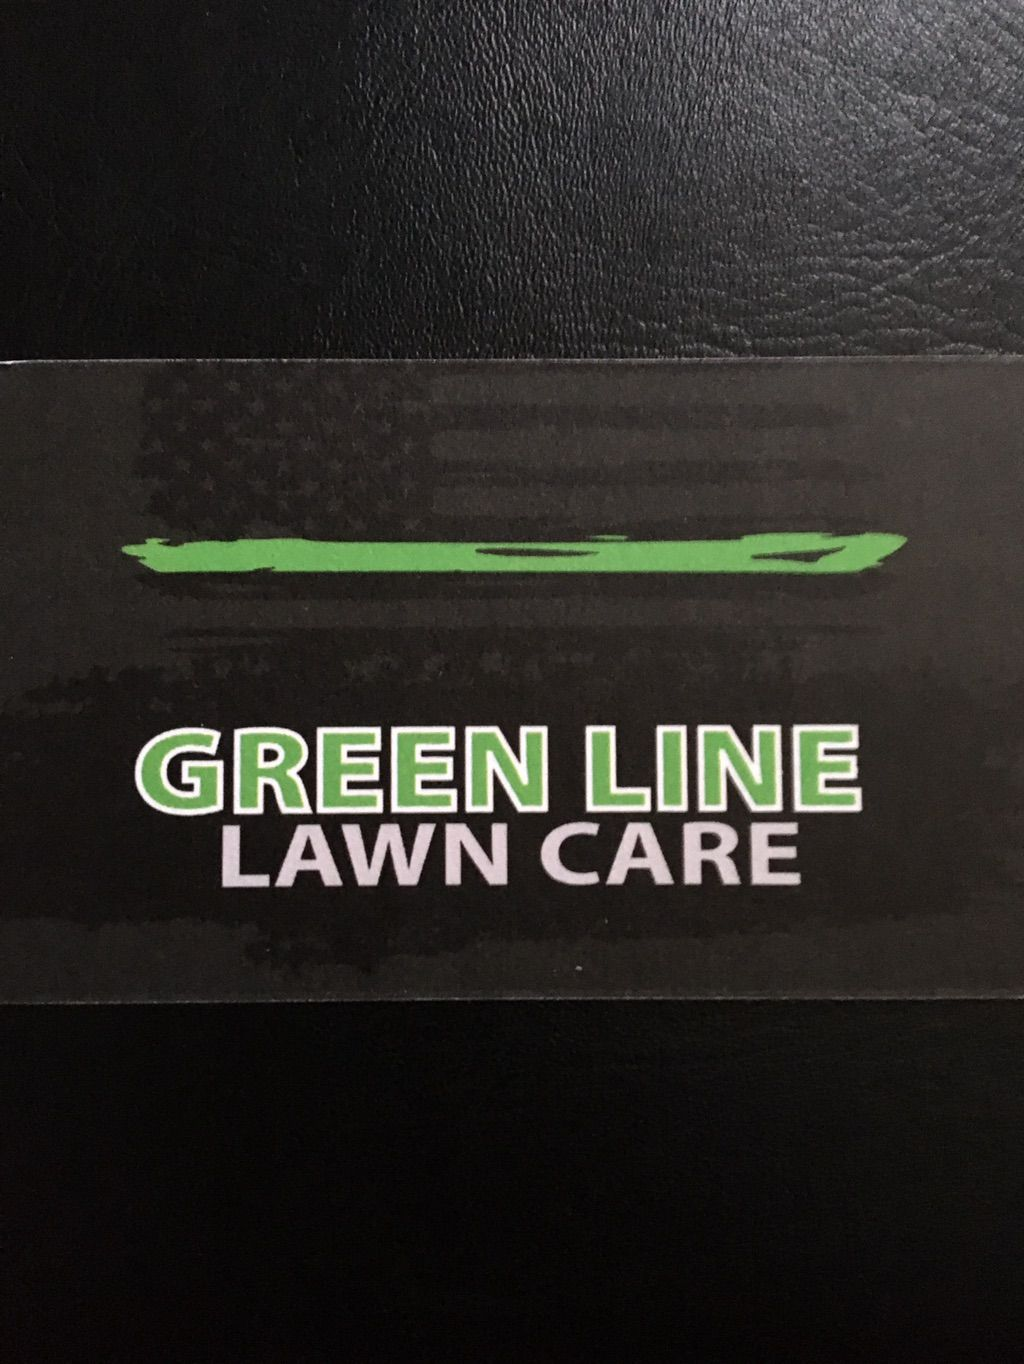 Green Line Lawn Care